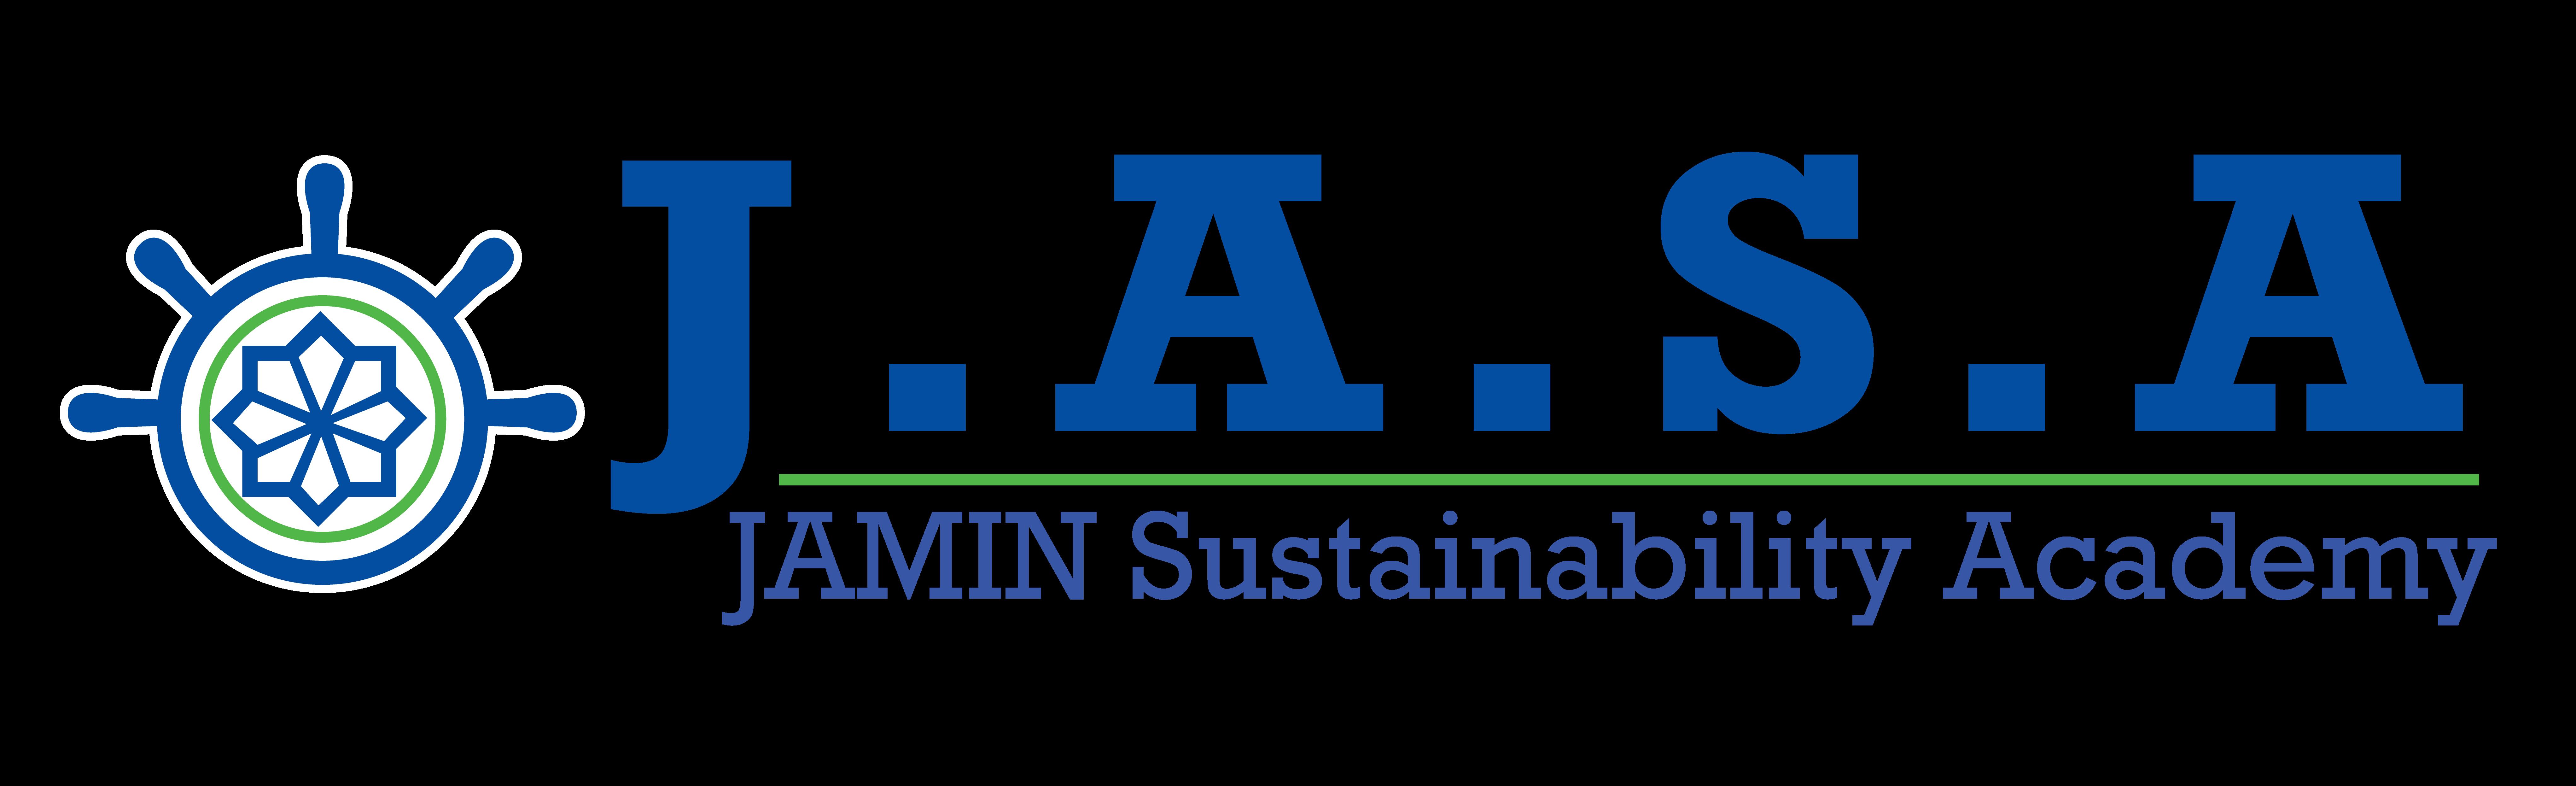 Jamin Sustainability Academy